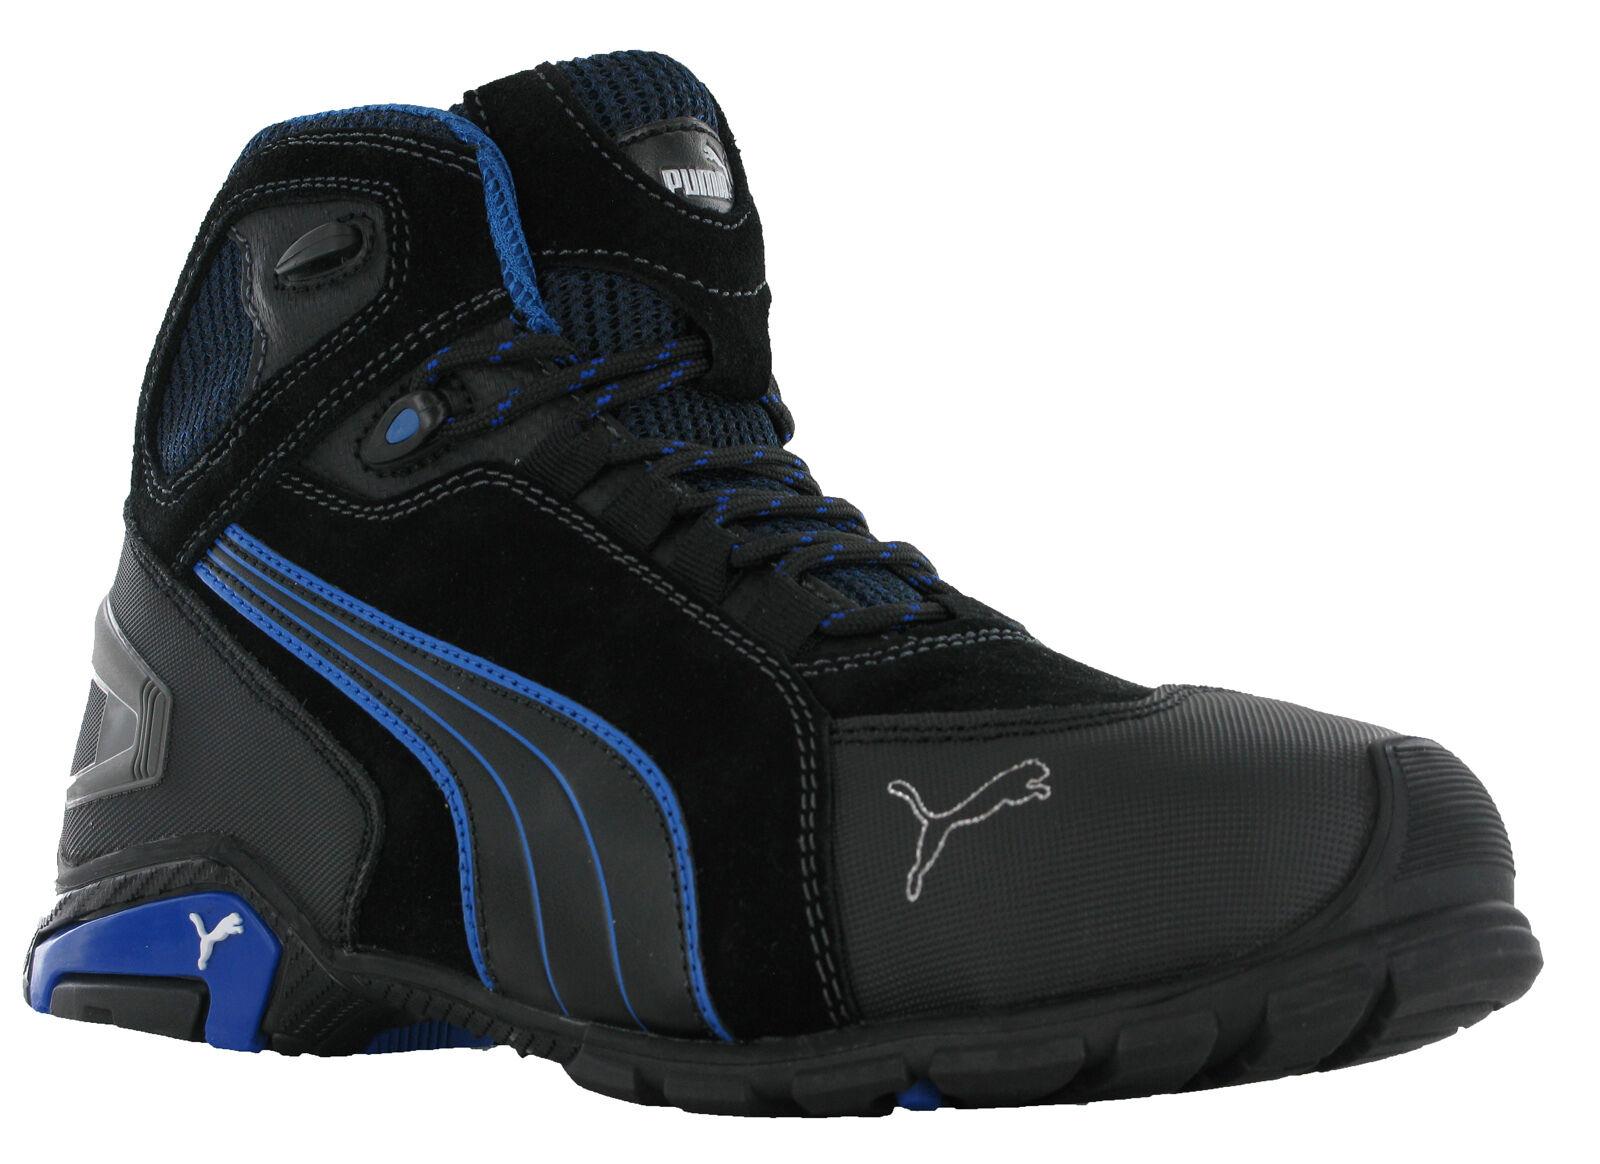 Details zu Puma Rio Low Mid Mens S3 SRC Safety Midsole Toe Cap Trainers Shoes Boots UK6 12